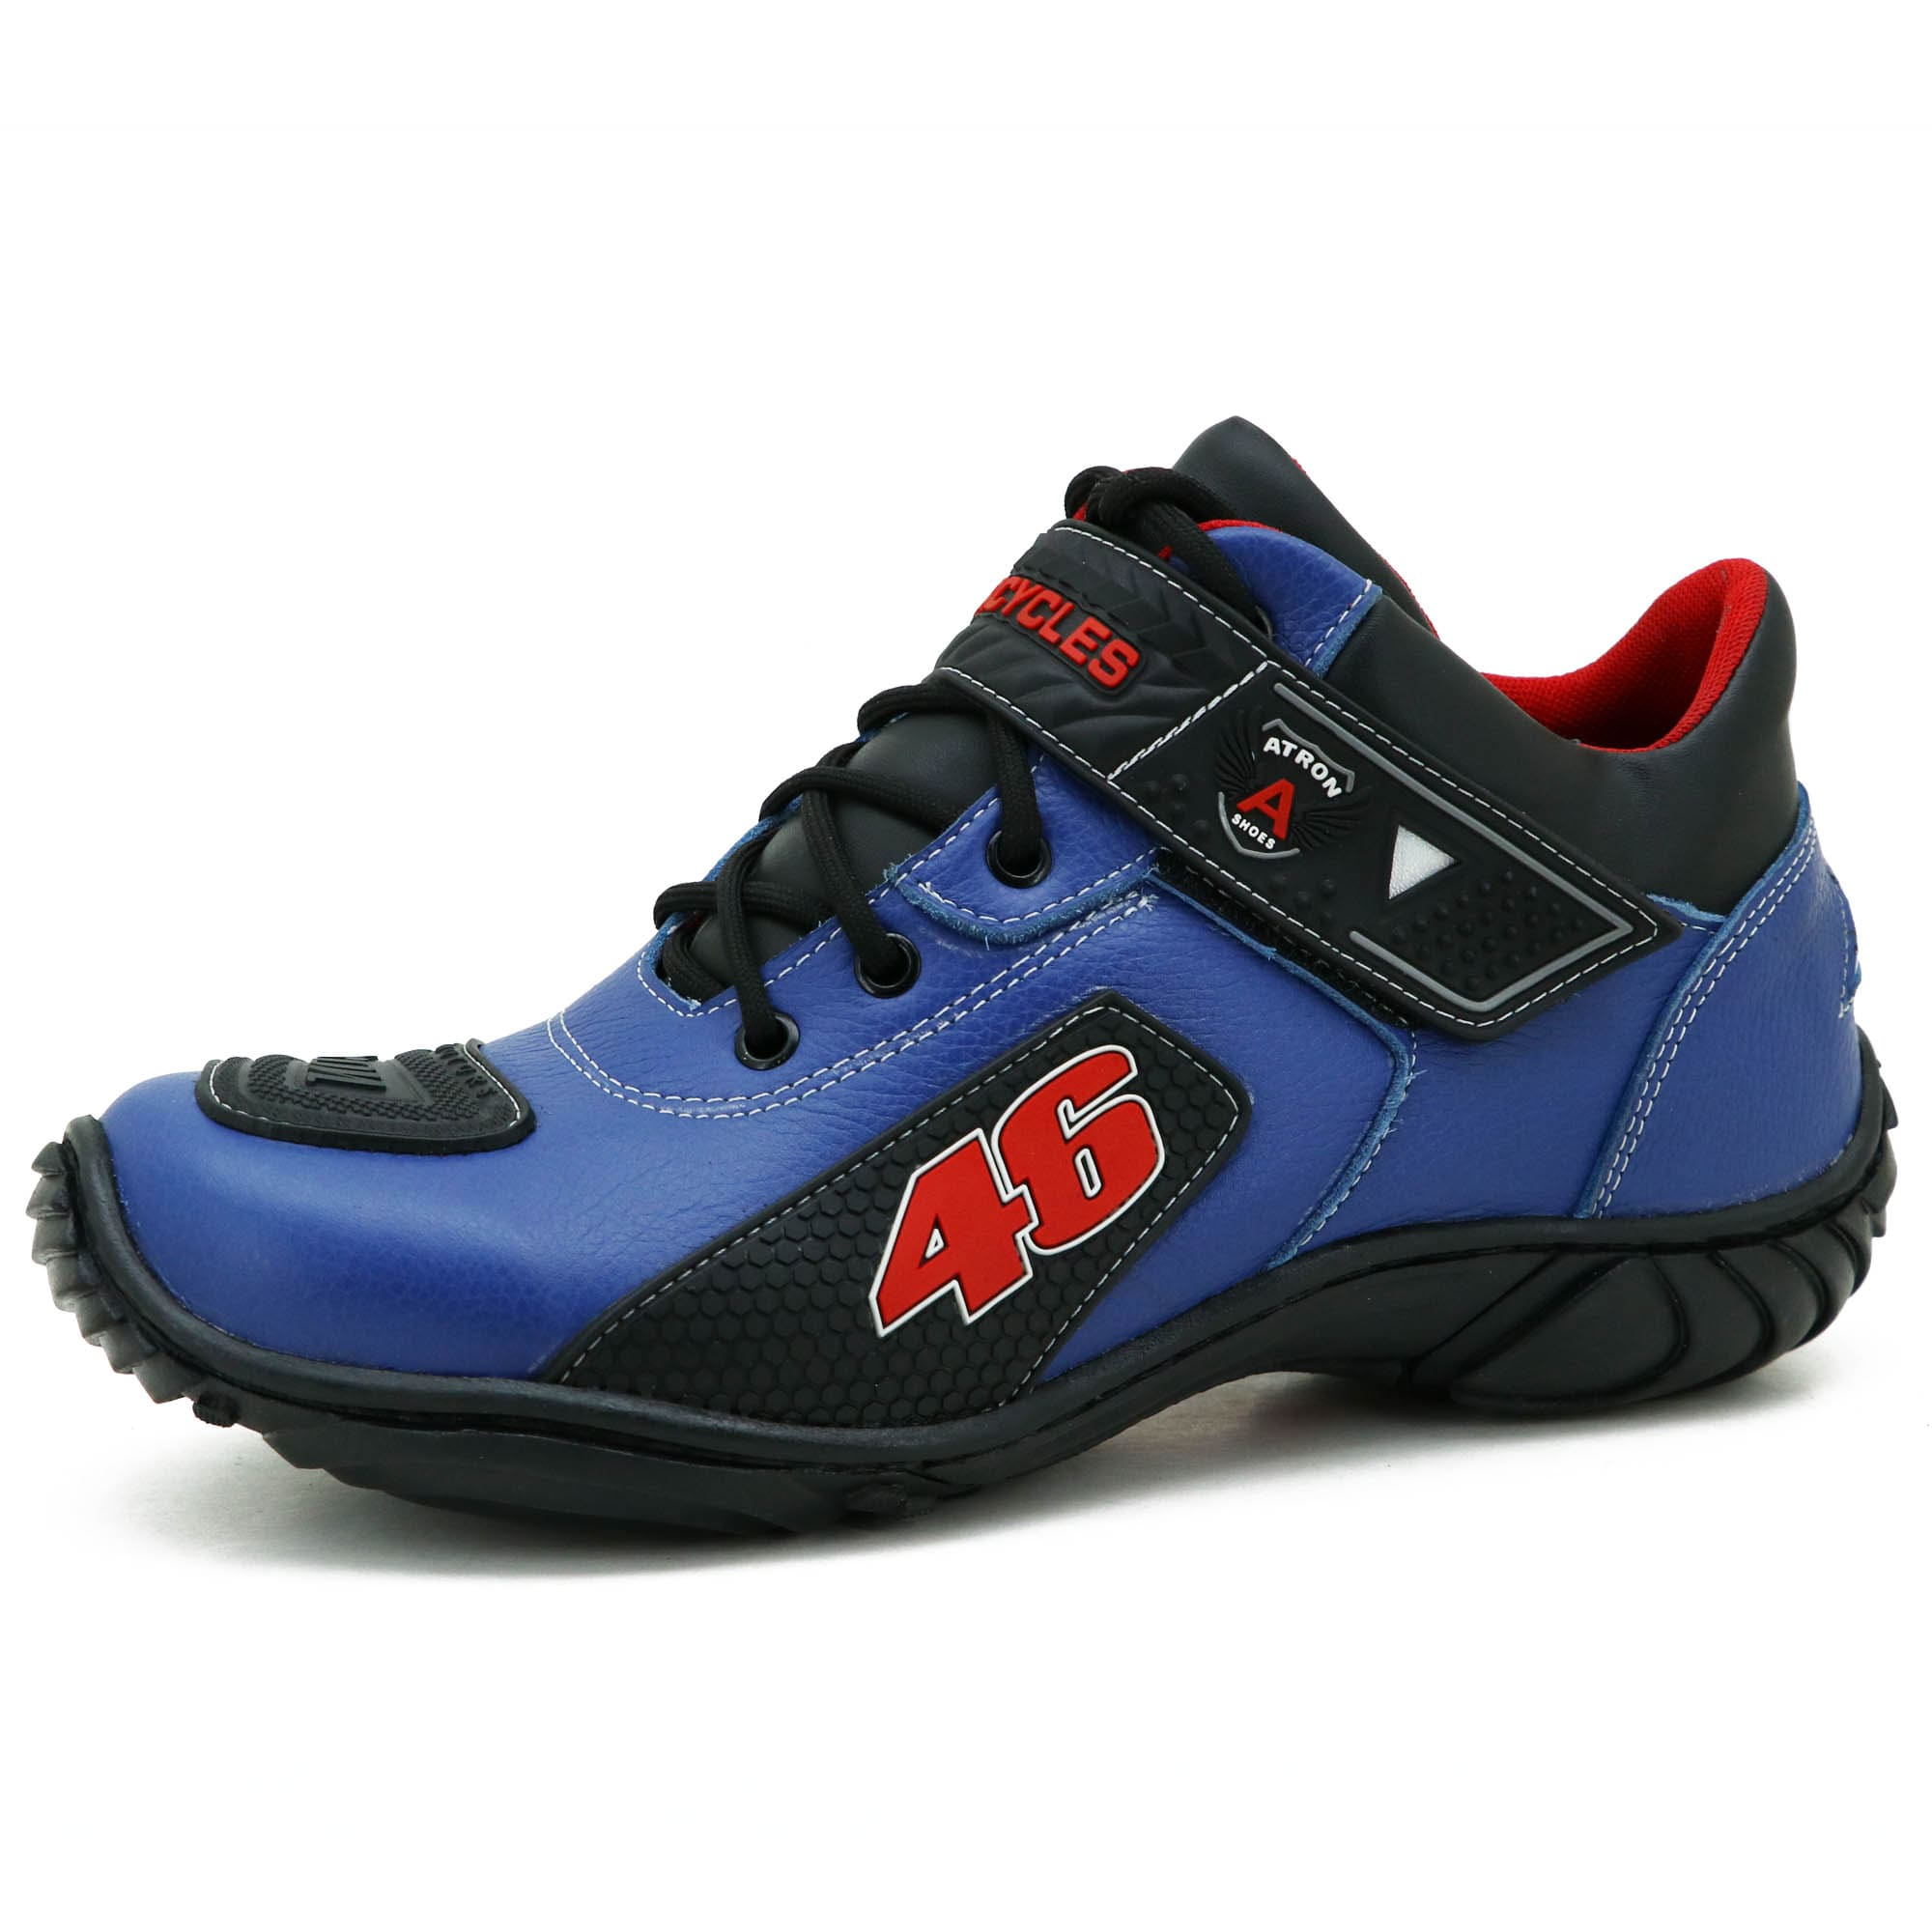 Bota motociclista Valentino Rossi azul 46 401